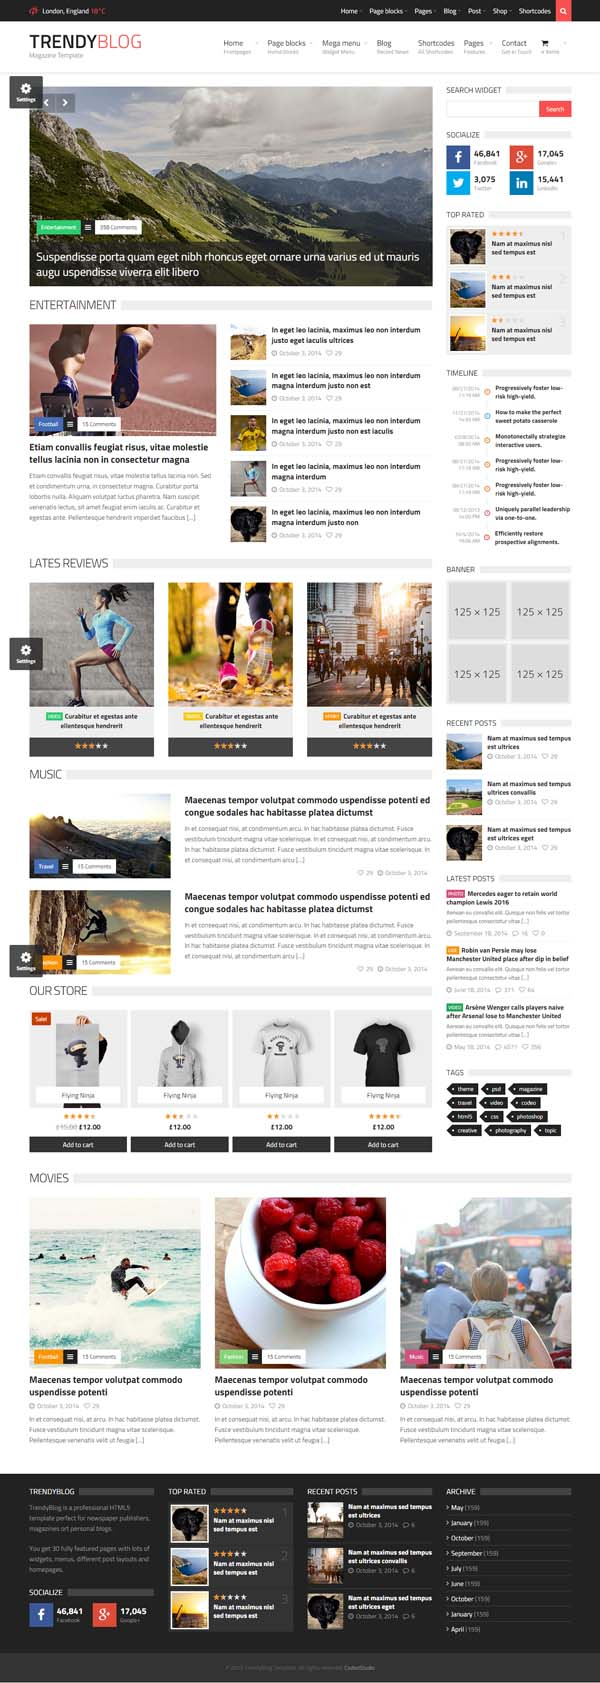 TrendyBlog - Multipurpose Magazine Template